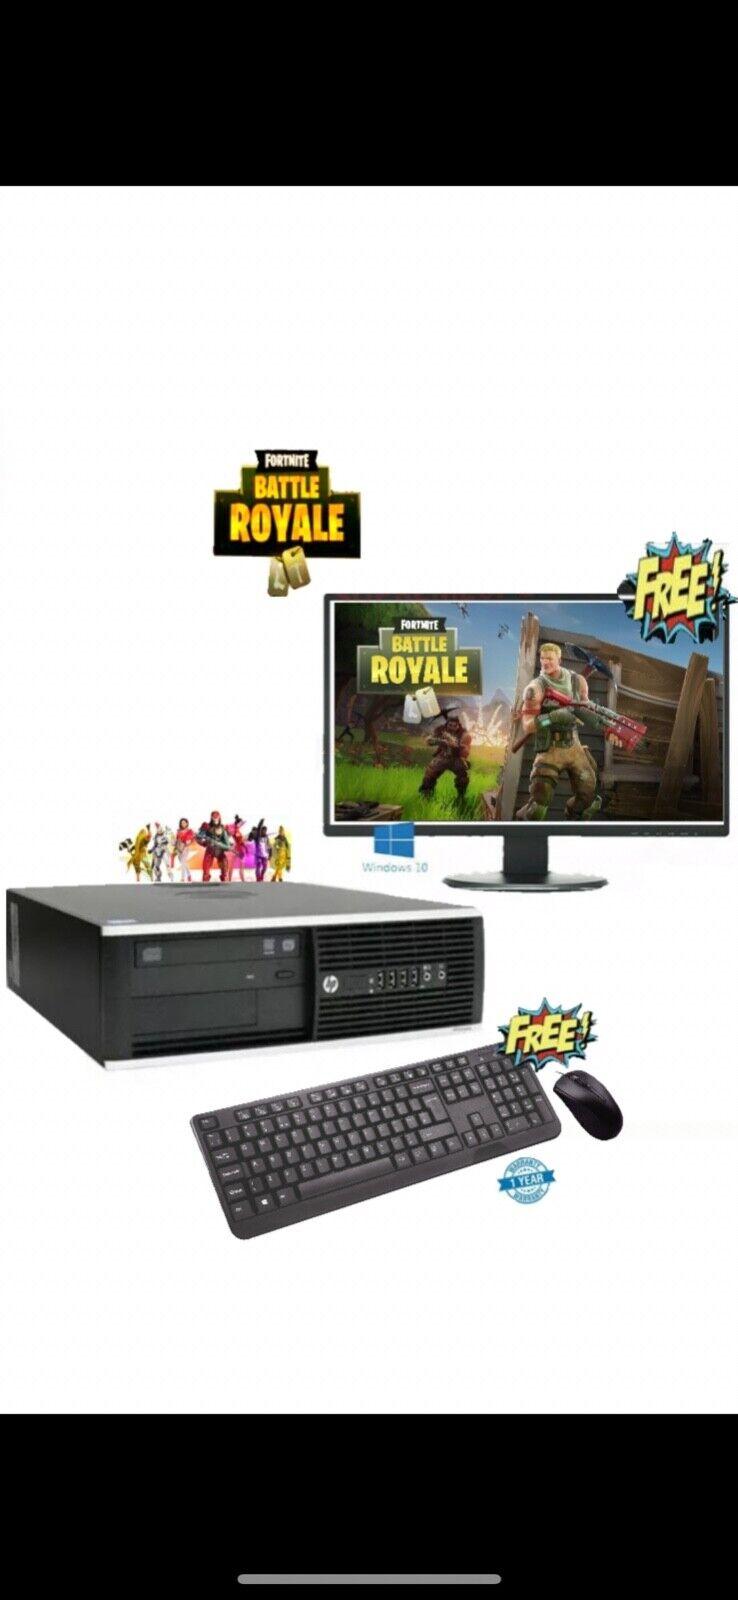 Computer Games - Gaming PC Computer Quad Core i5 4th Gen 16GB Ram 120GB SSD + 1TB Win 10 Pro WiFi